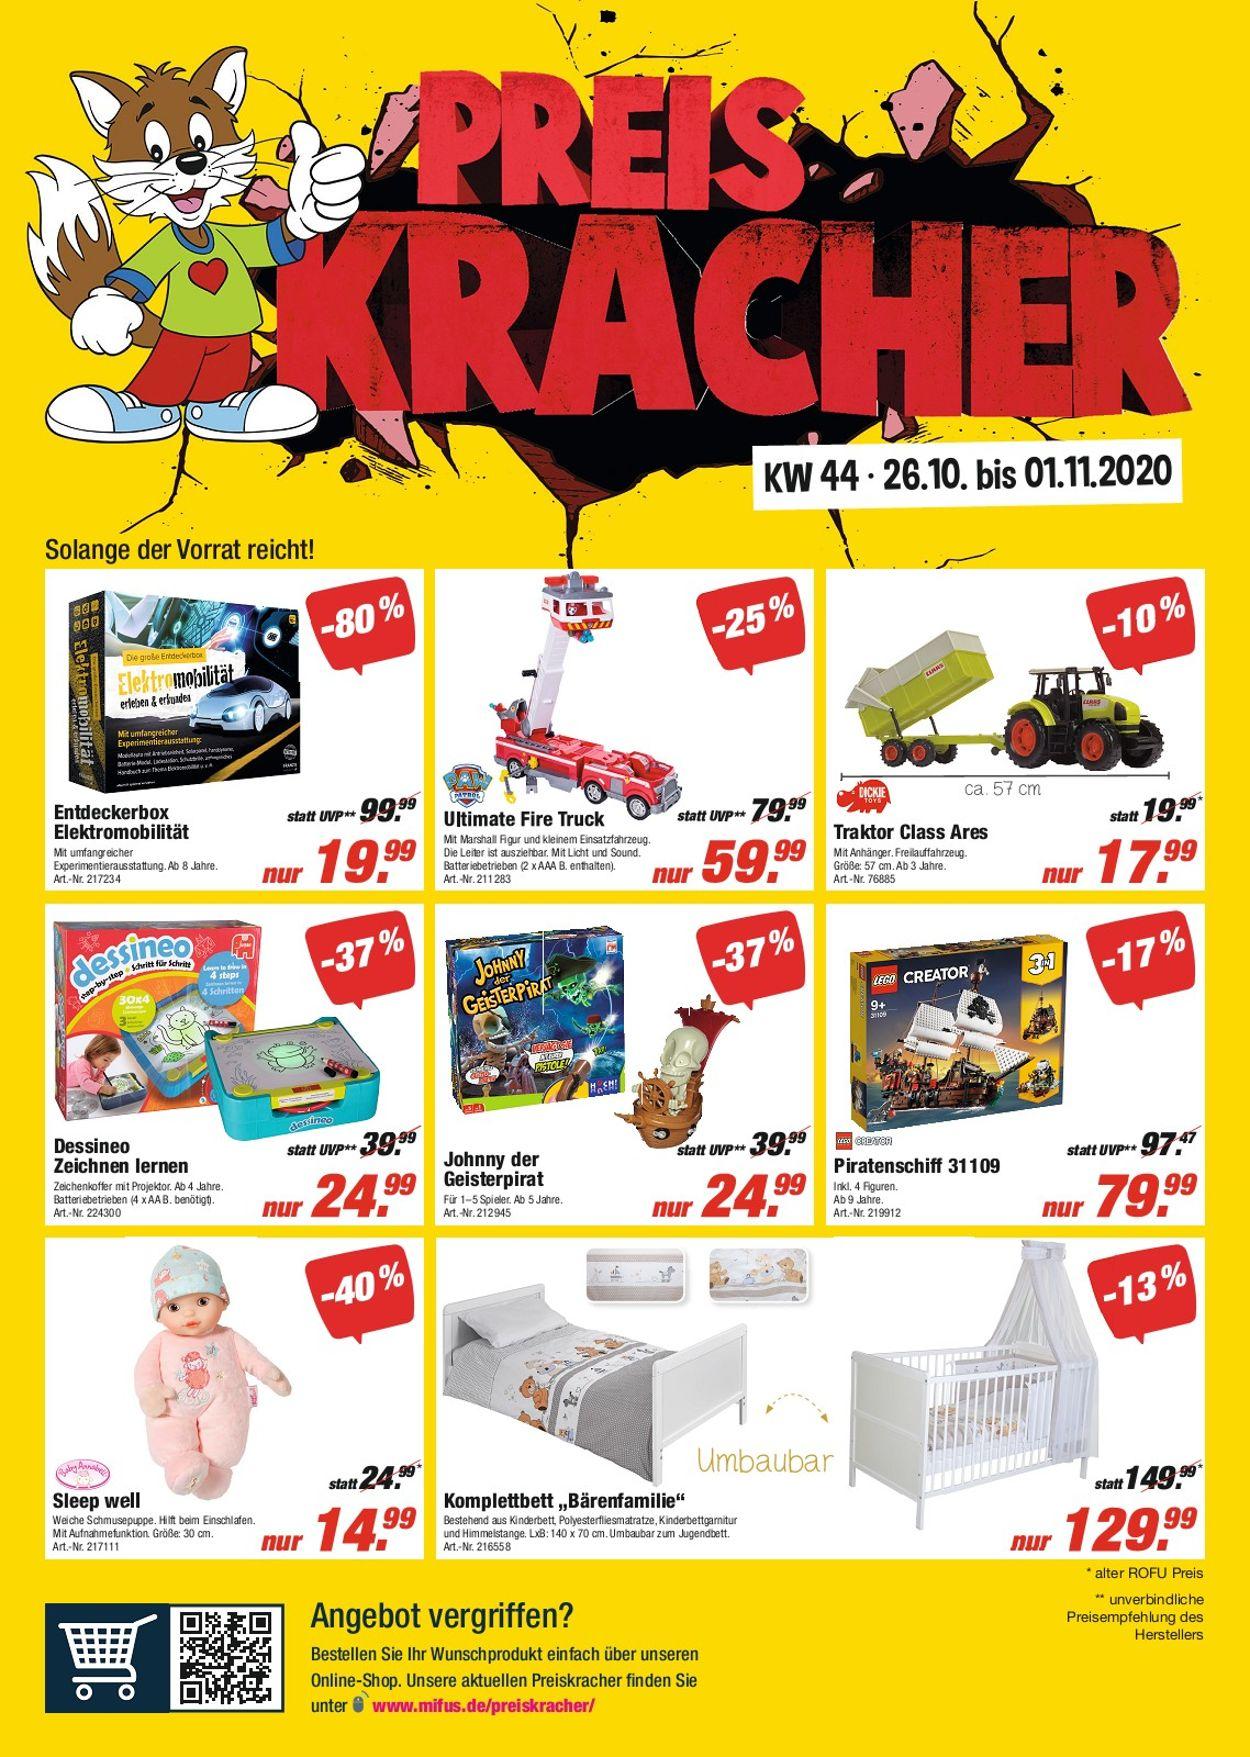 ROFU Kinderland Prospekt - Aktuell vom 26.10-01.11.2020